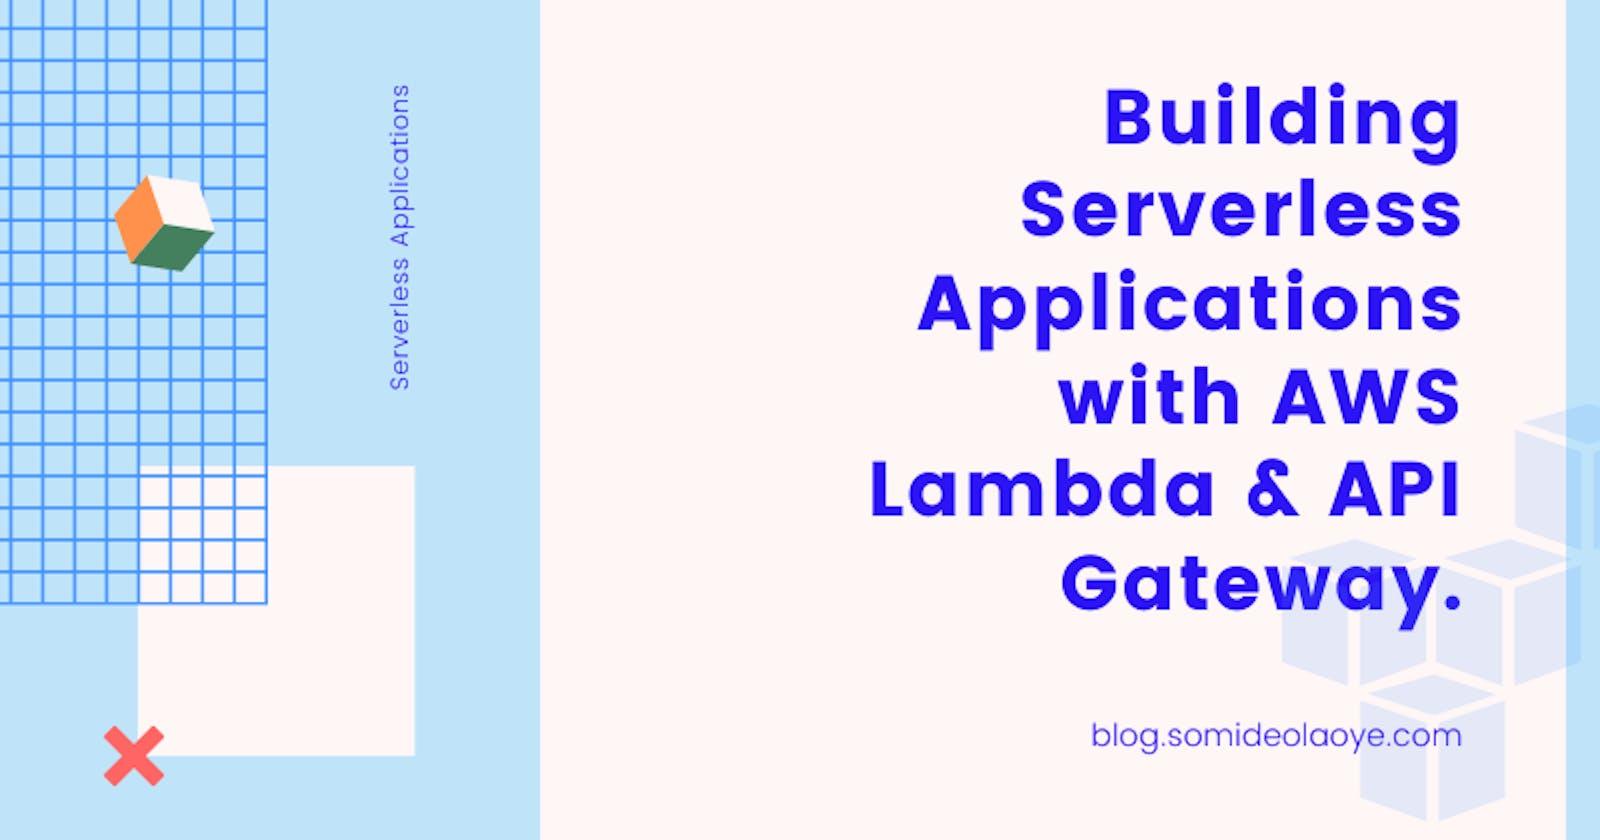 Building Serverless Applications with AWS Lambda & API Gateway